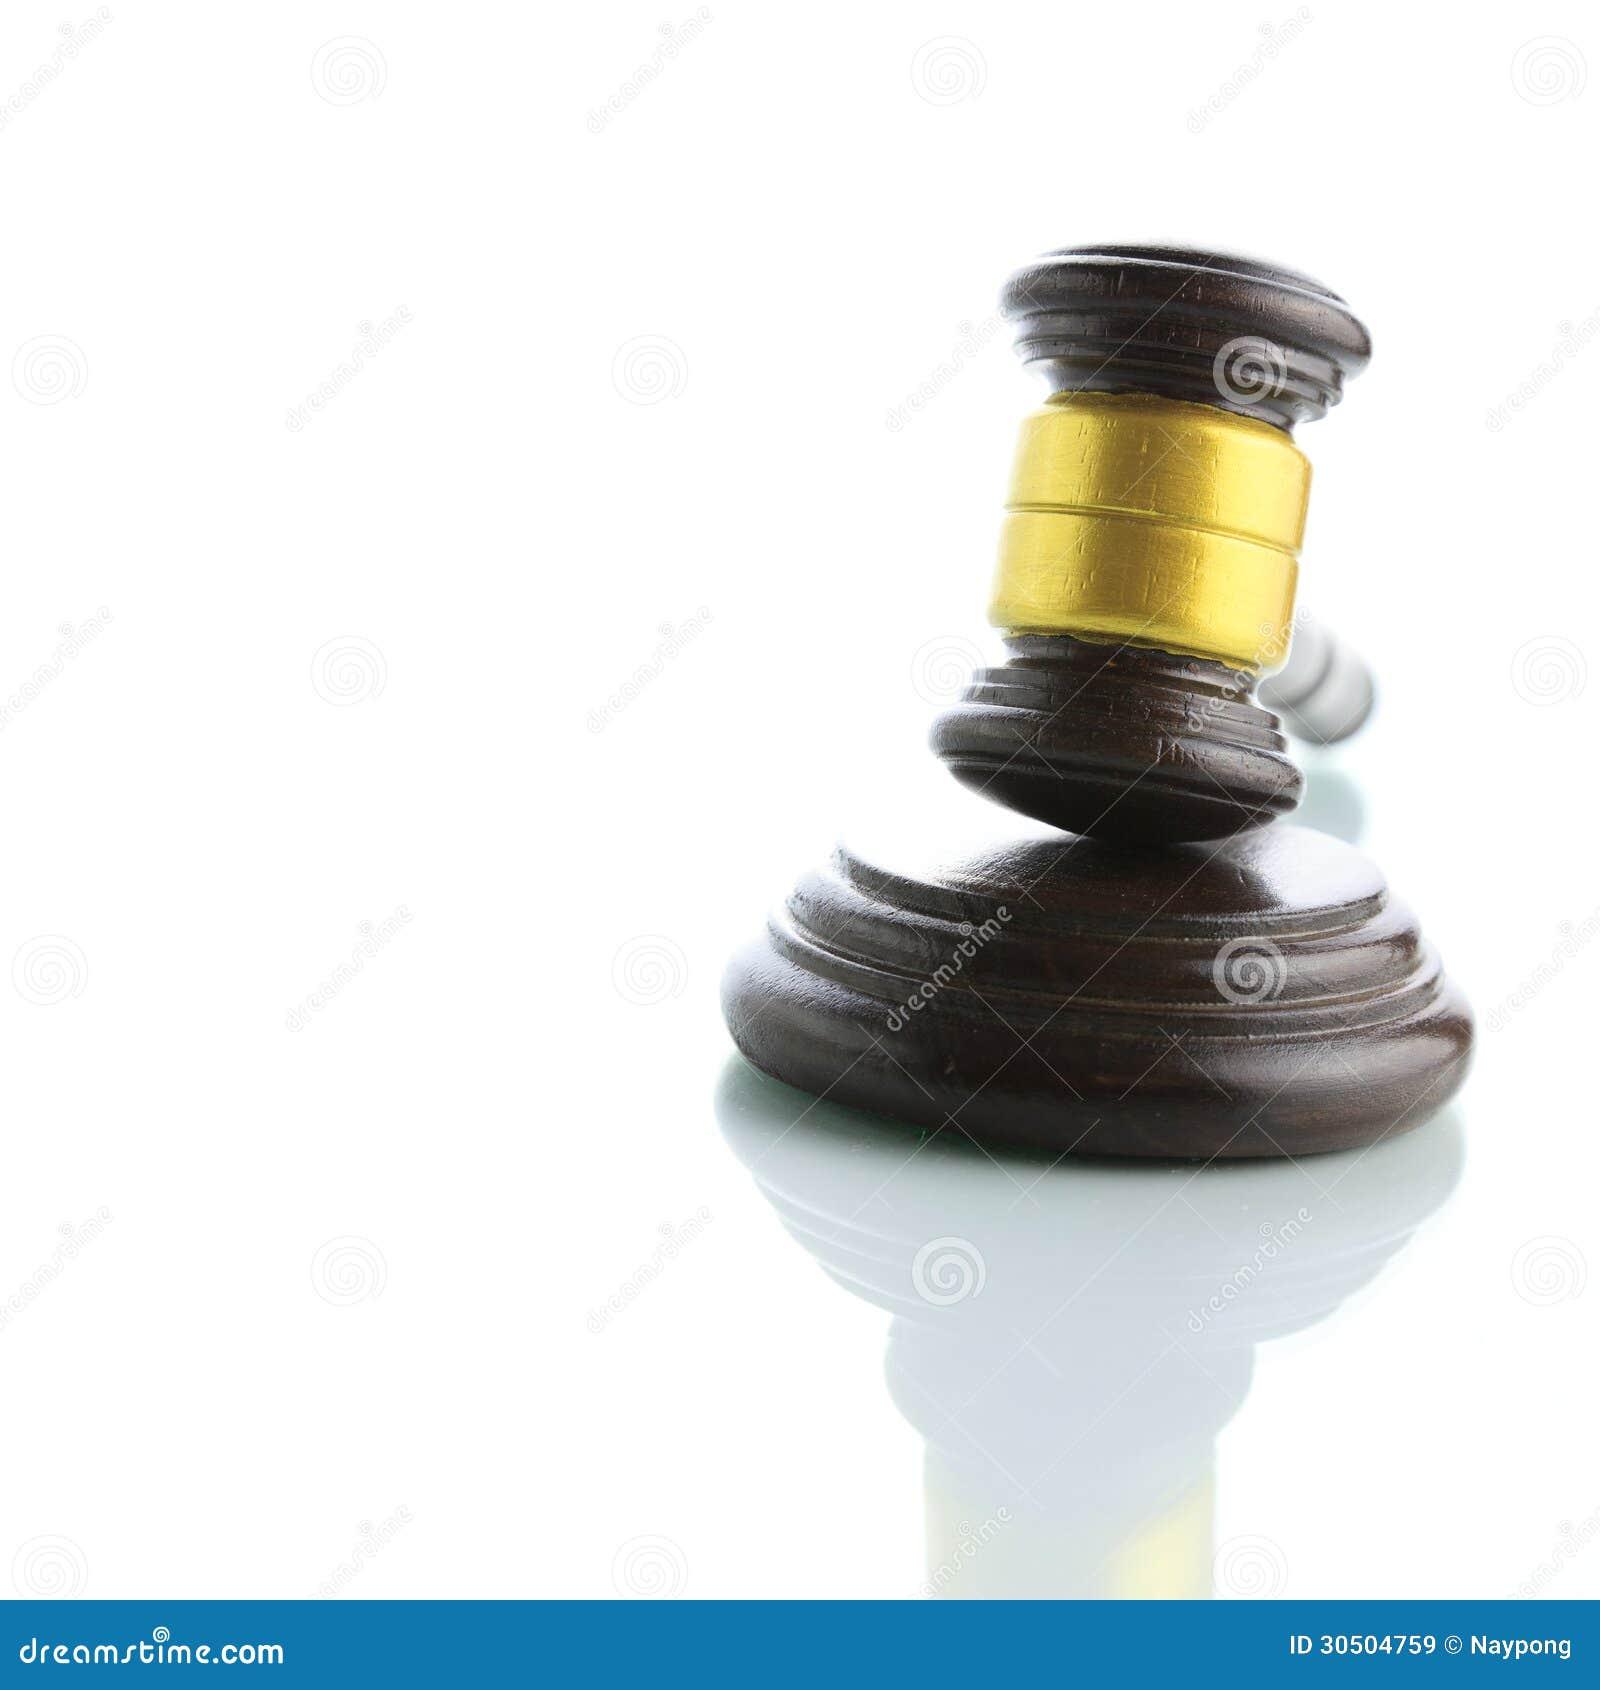 Judge Gavel Royalty Free Stock Images - Image: 30504759